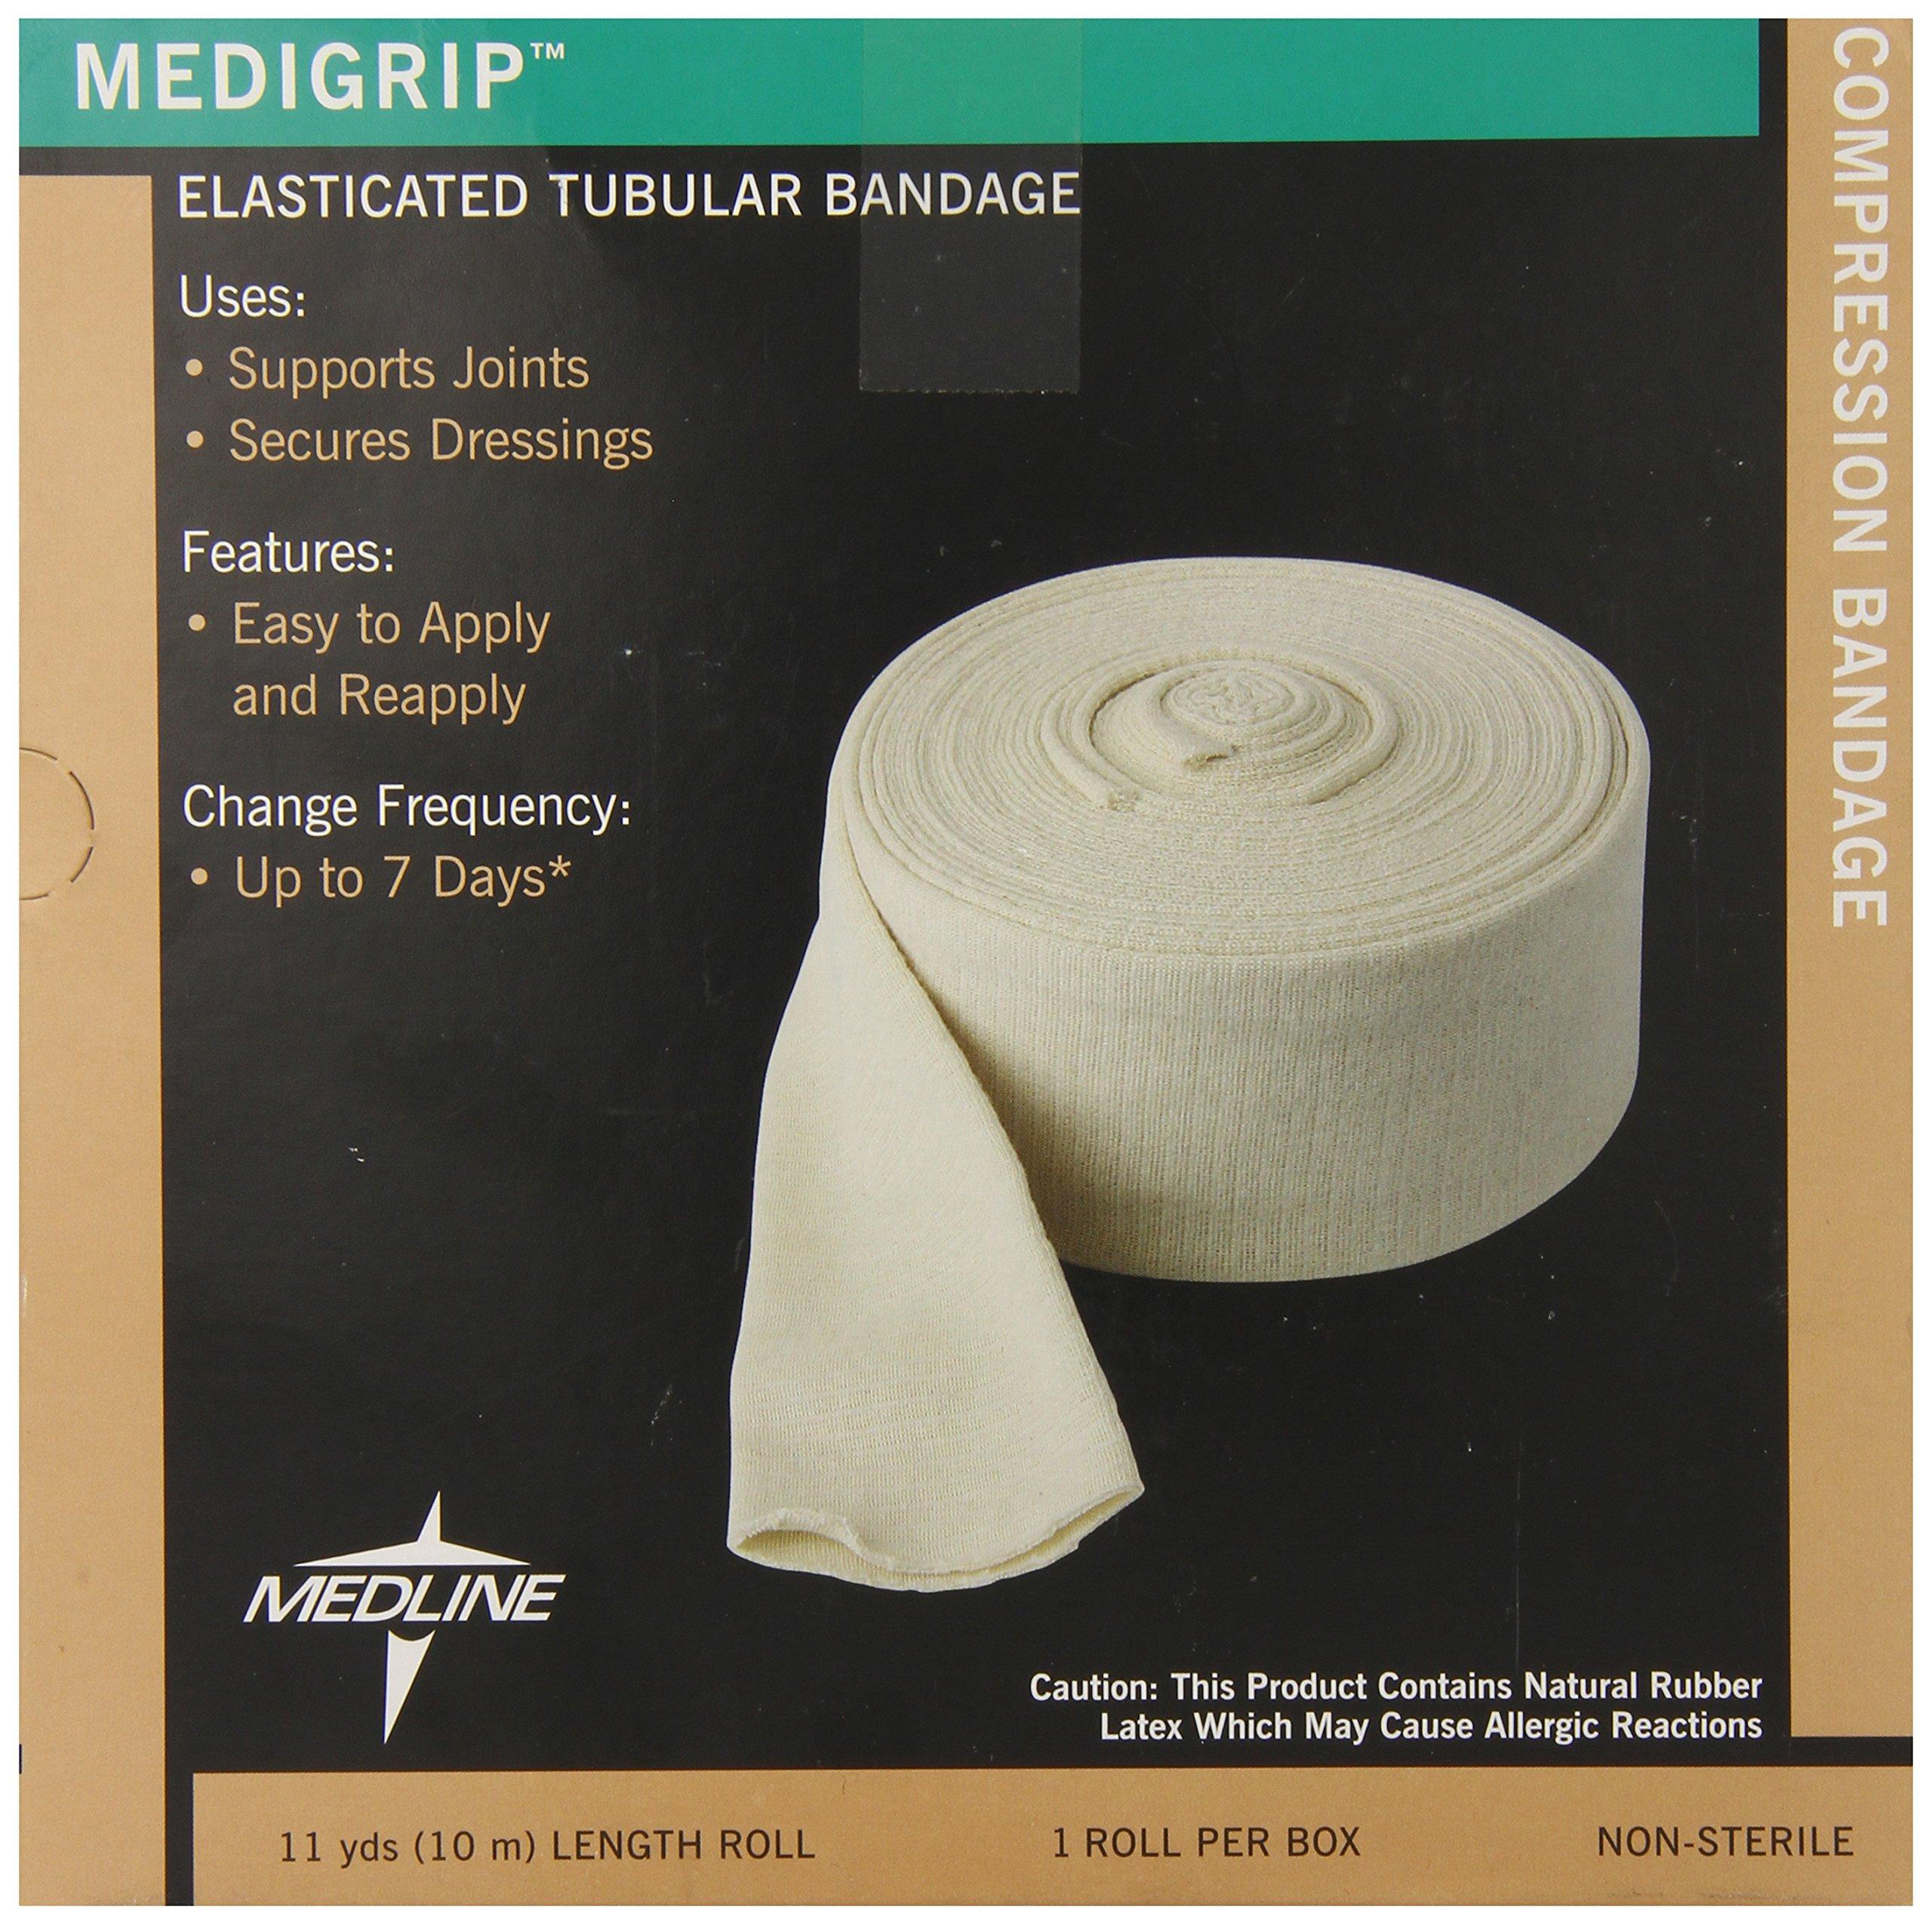 Medline Bandage Tubular Elastic Medigrip, Size D